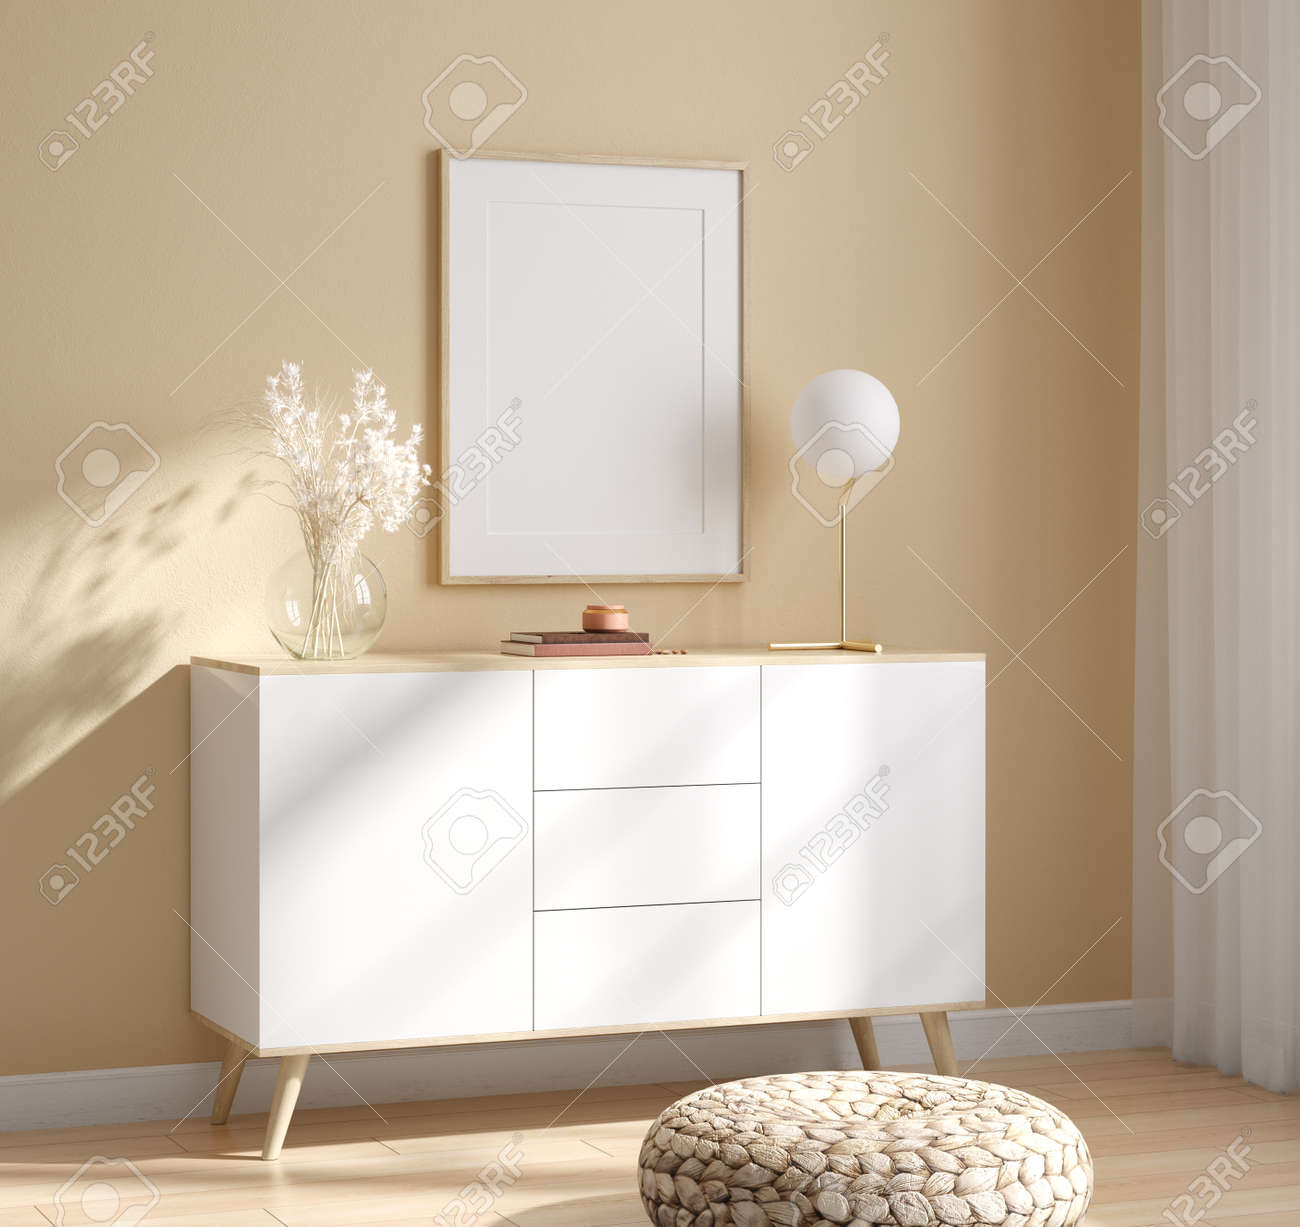 Mockup frame in interior background, room in light pastel colors, Scandinavian style, 3d render - 157100656